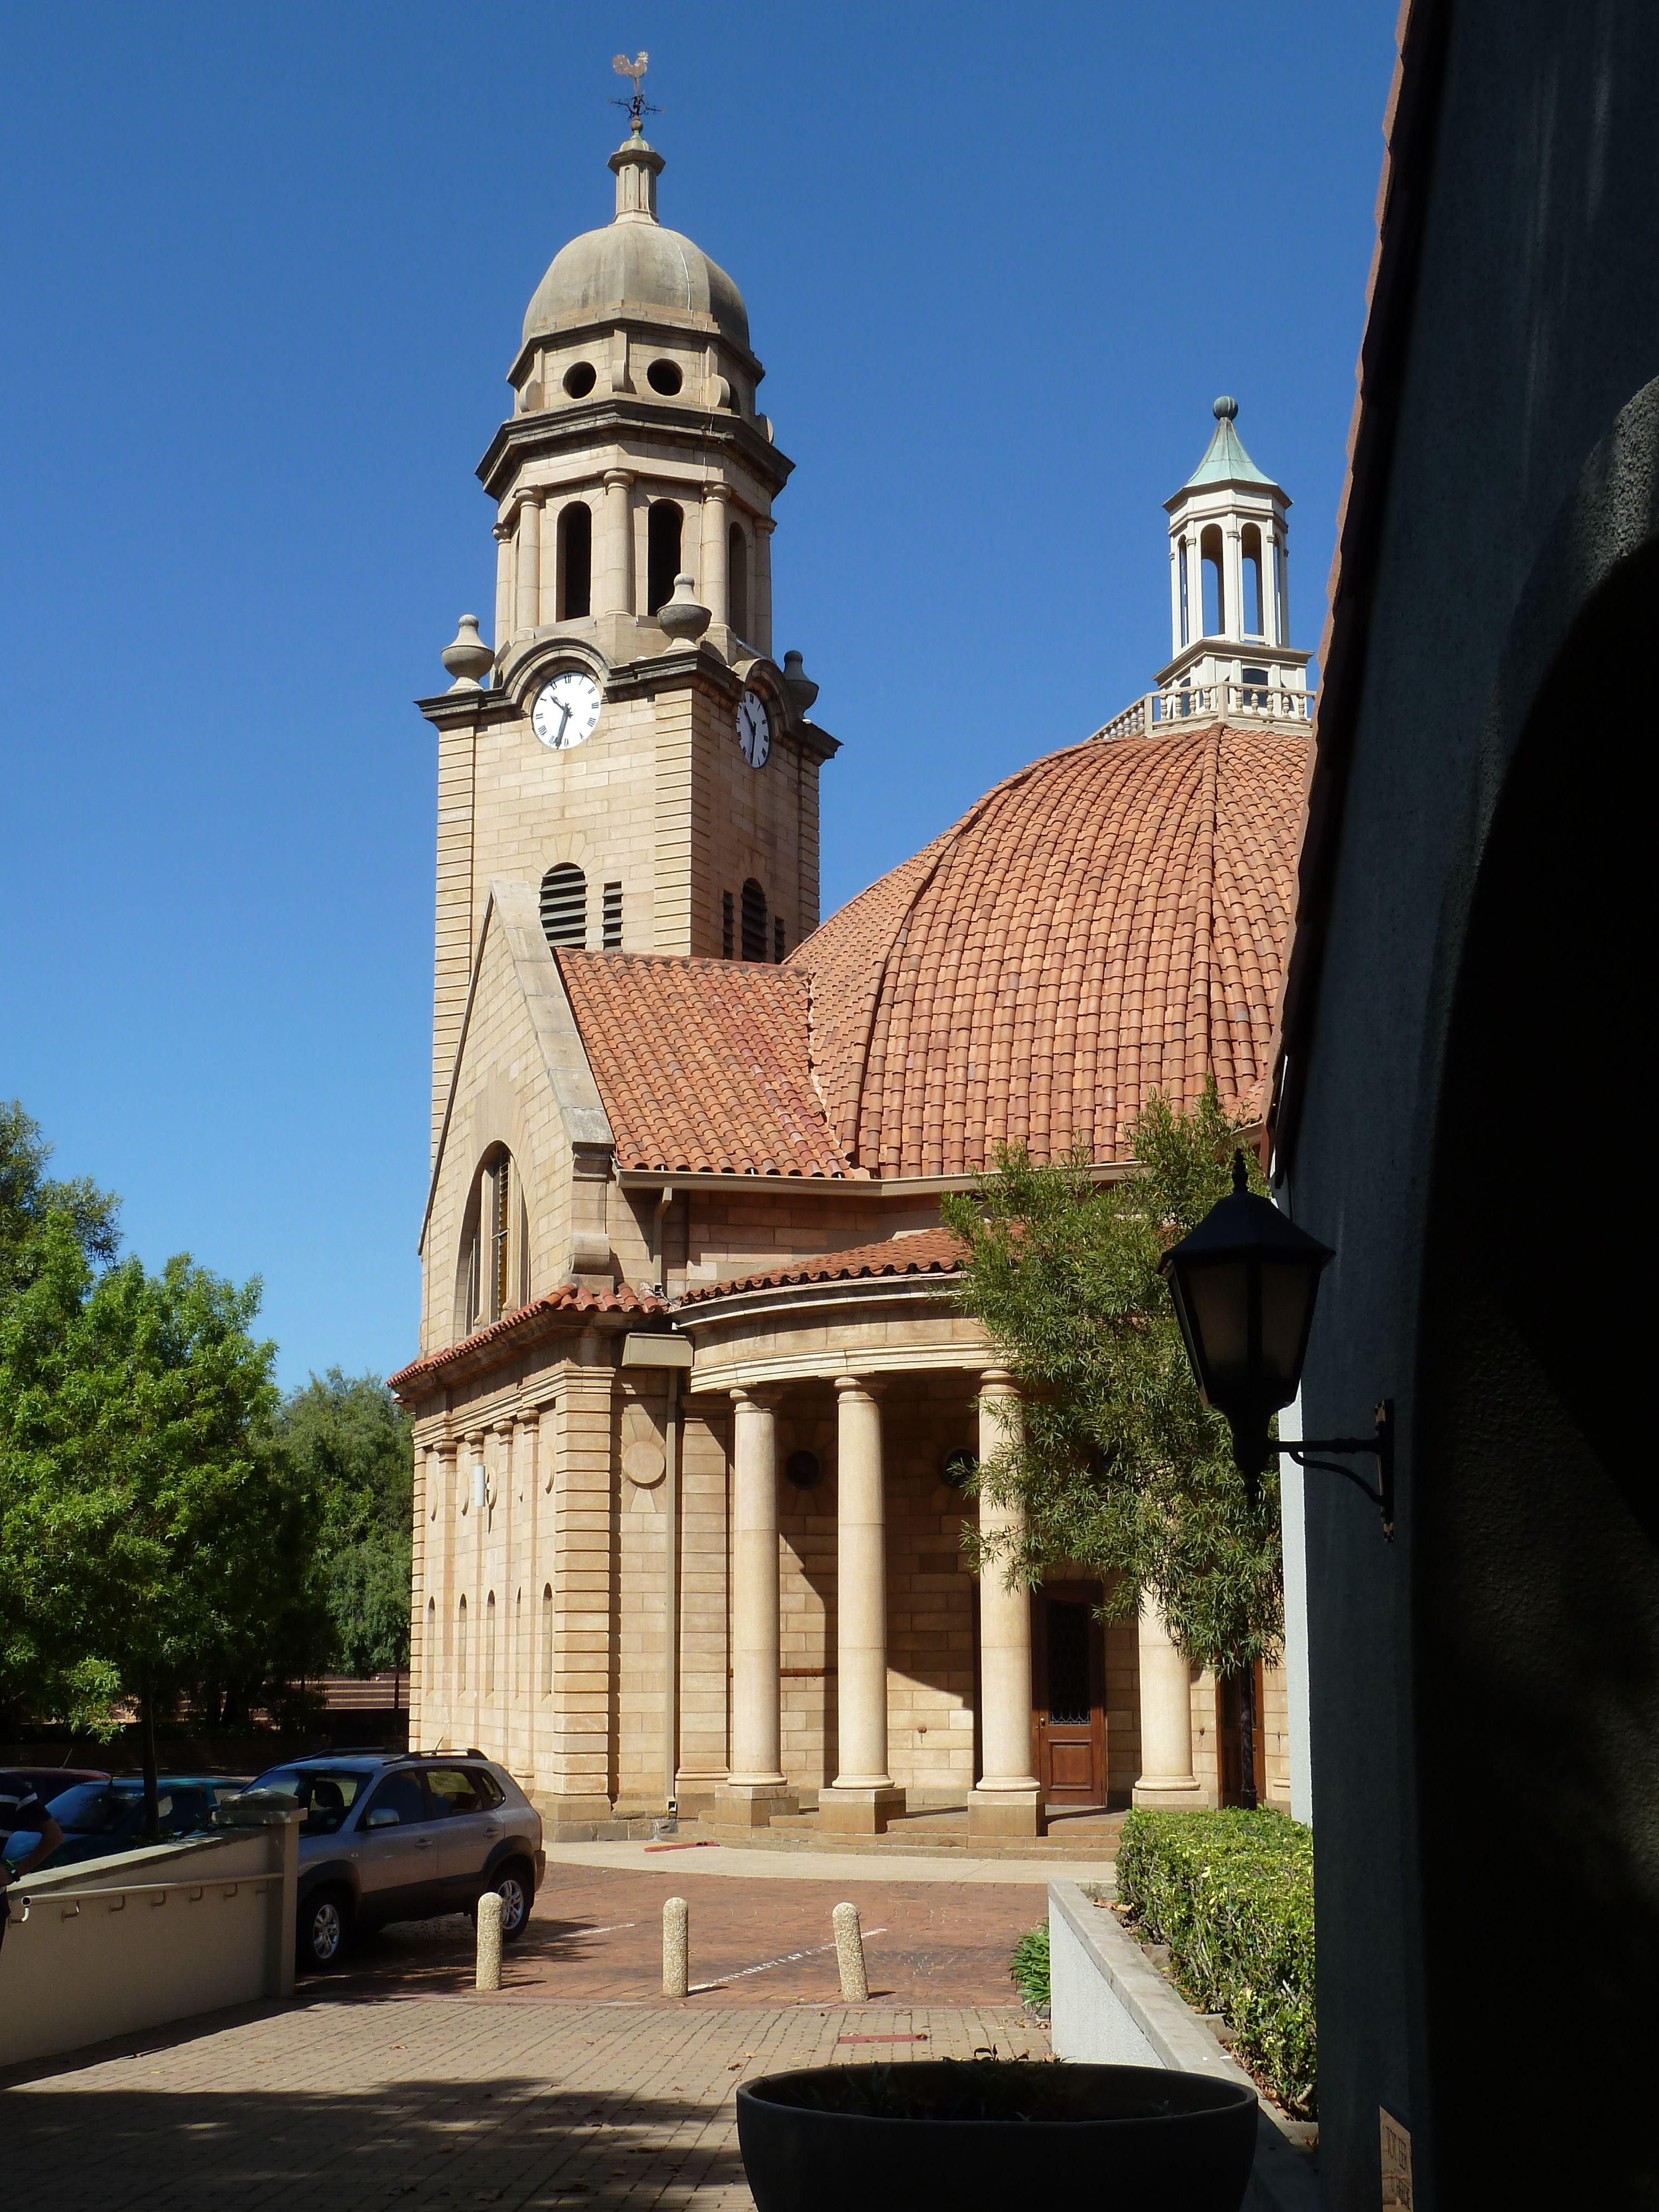 Sunnyside (Pretoria)